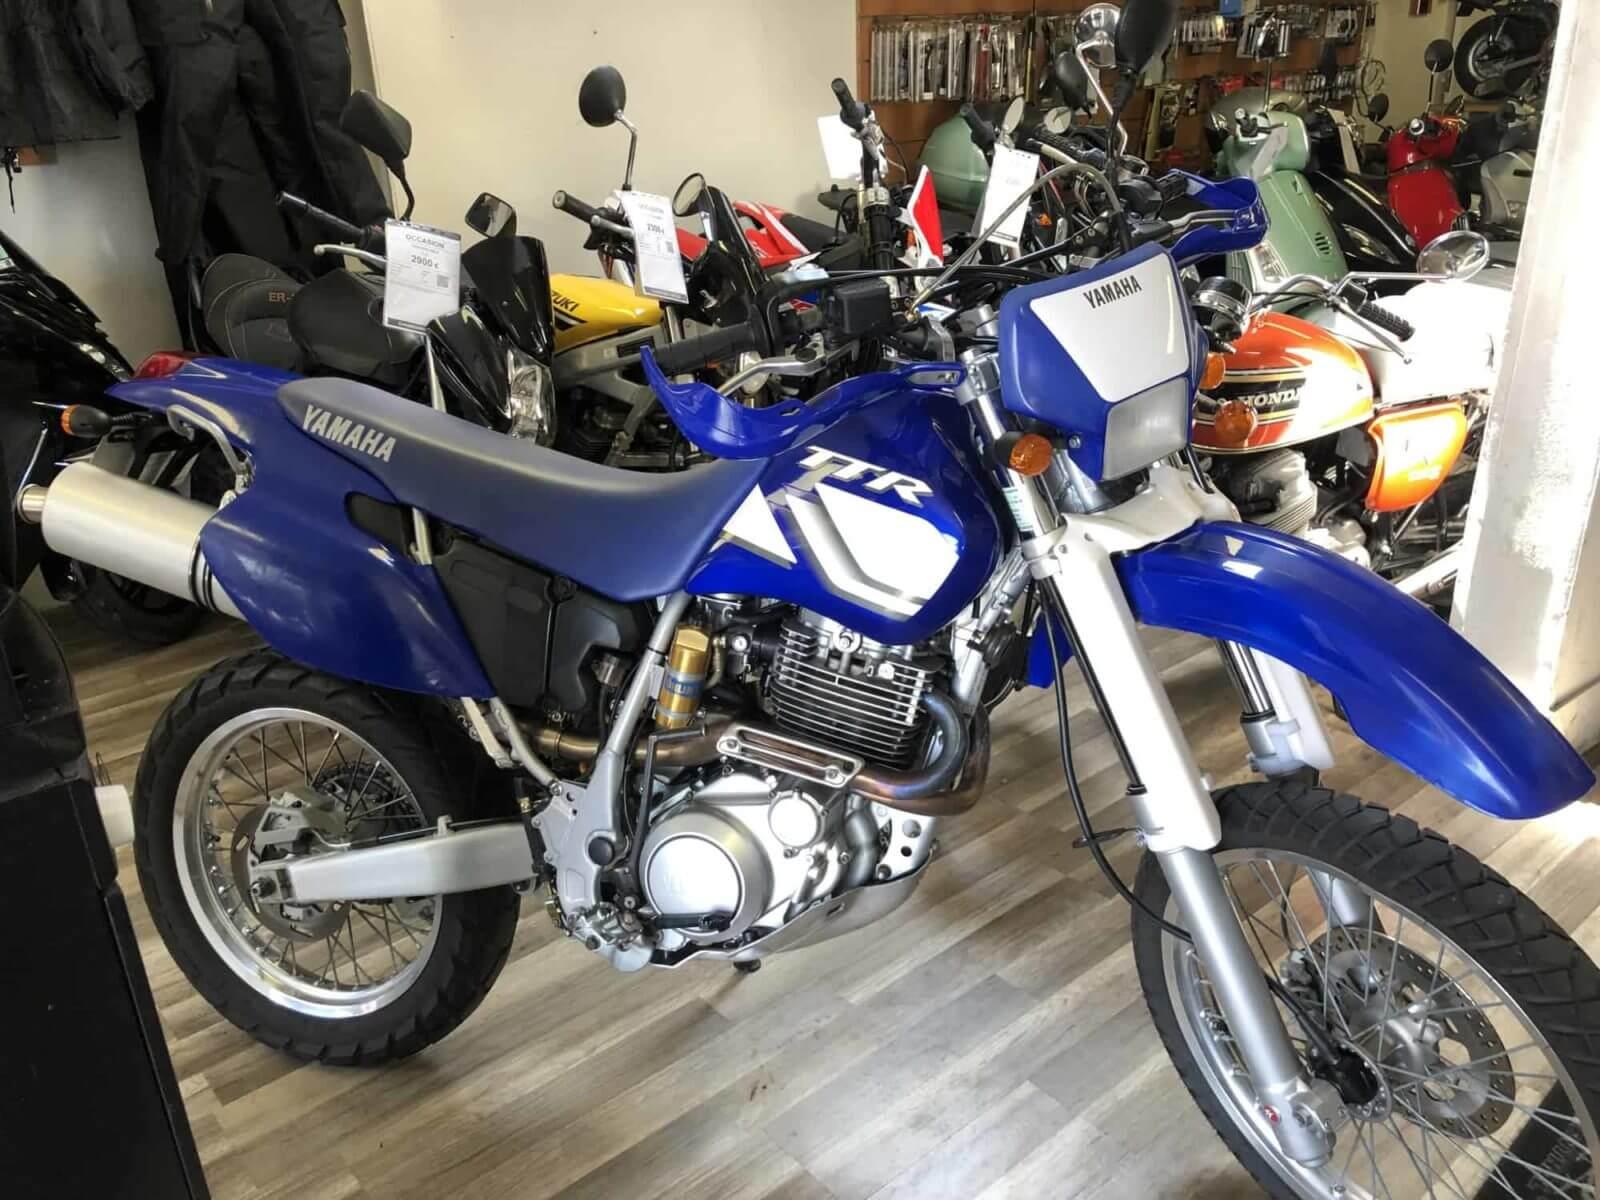 Vendu ! Yamaha TT 600R – 3000€